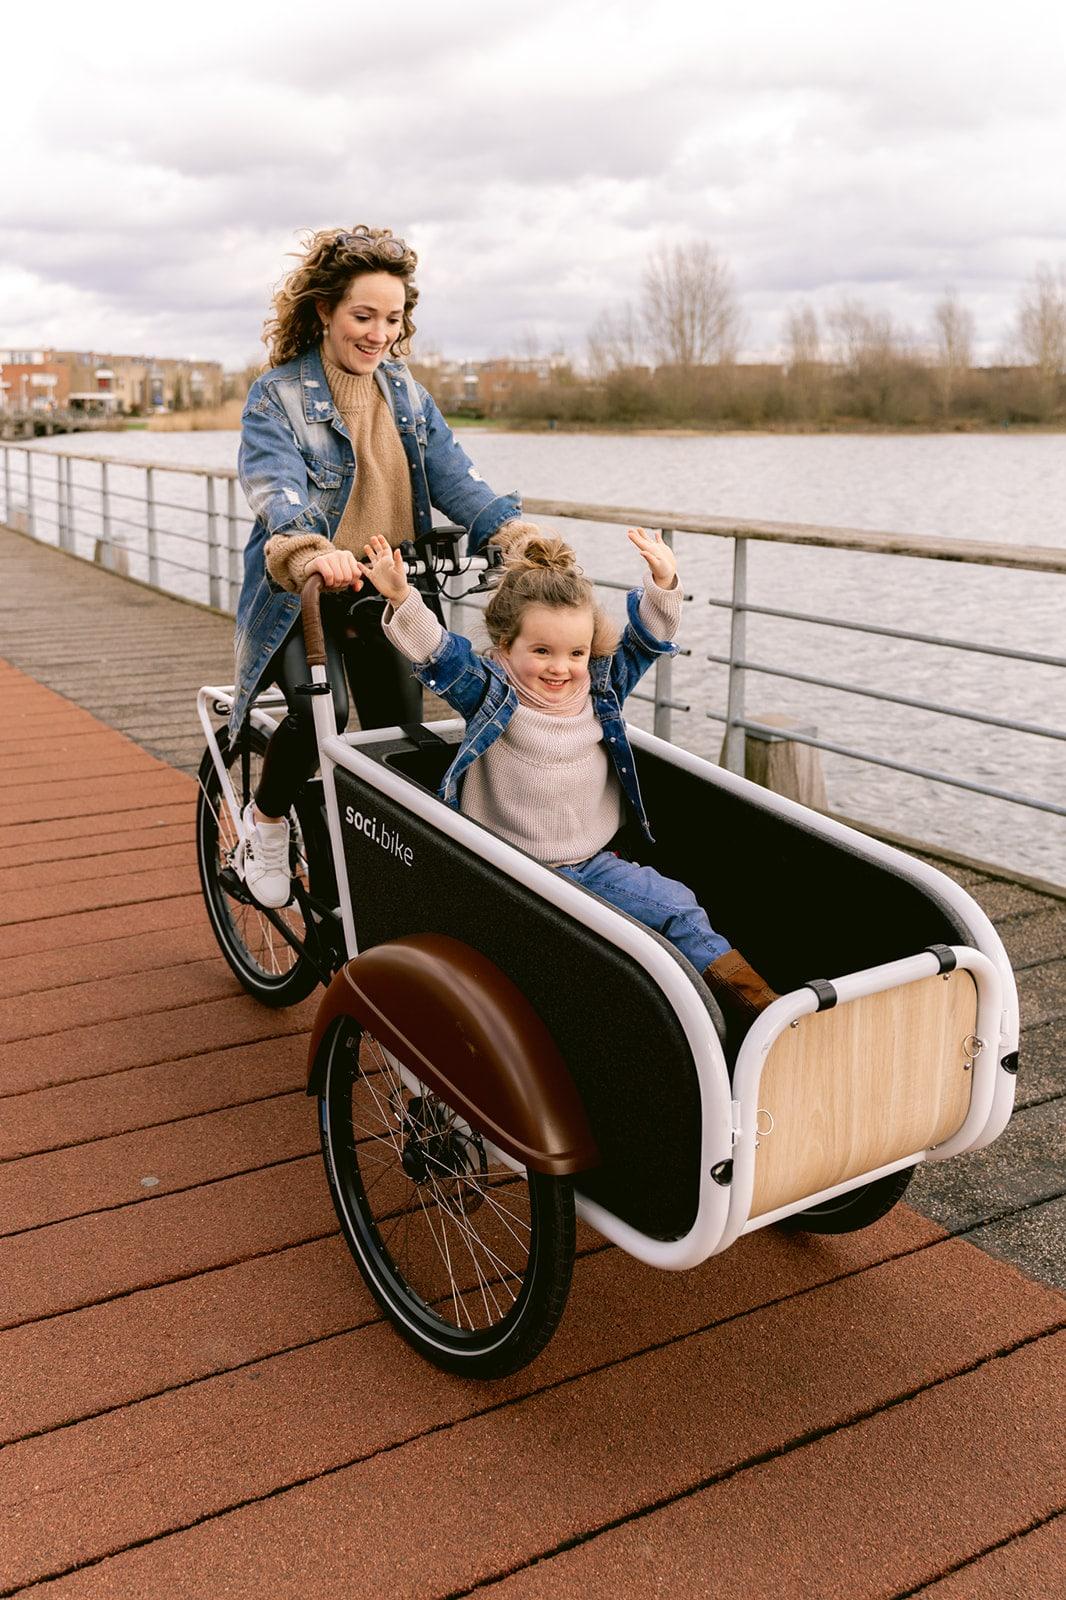 Over soci.bike ambassadeur Kassteele Tweewielers